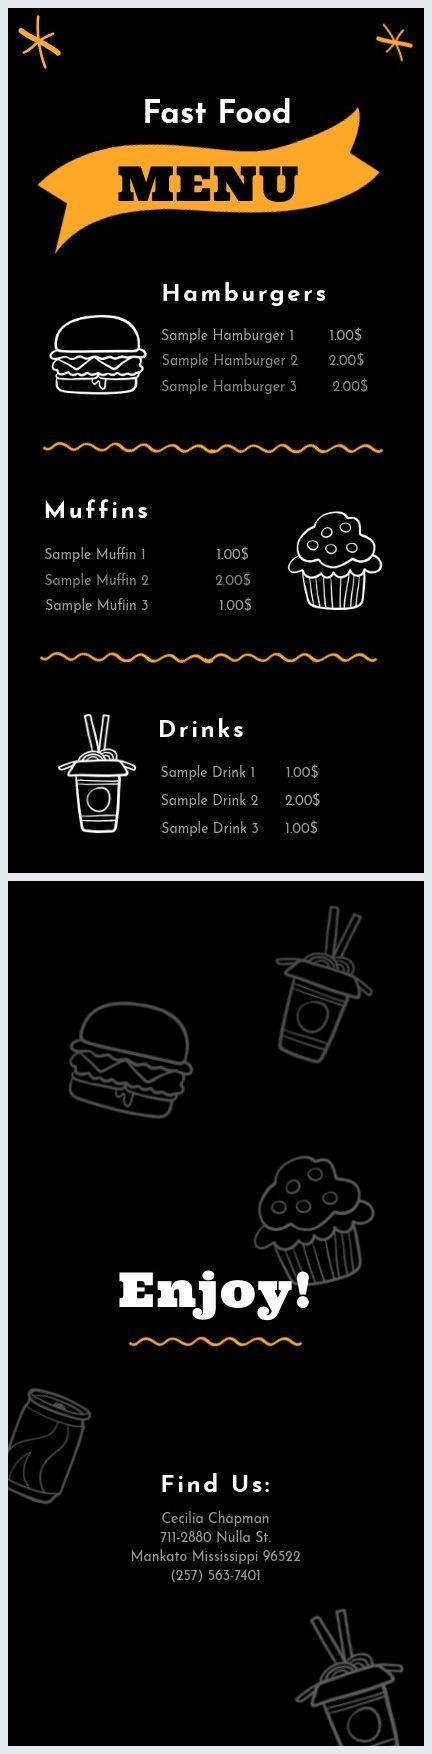 Fast food Menu Sjabloon